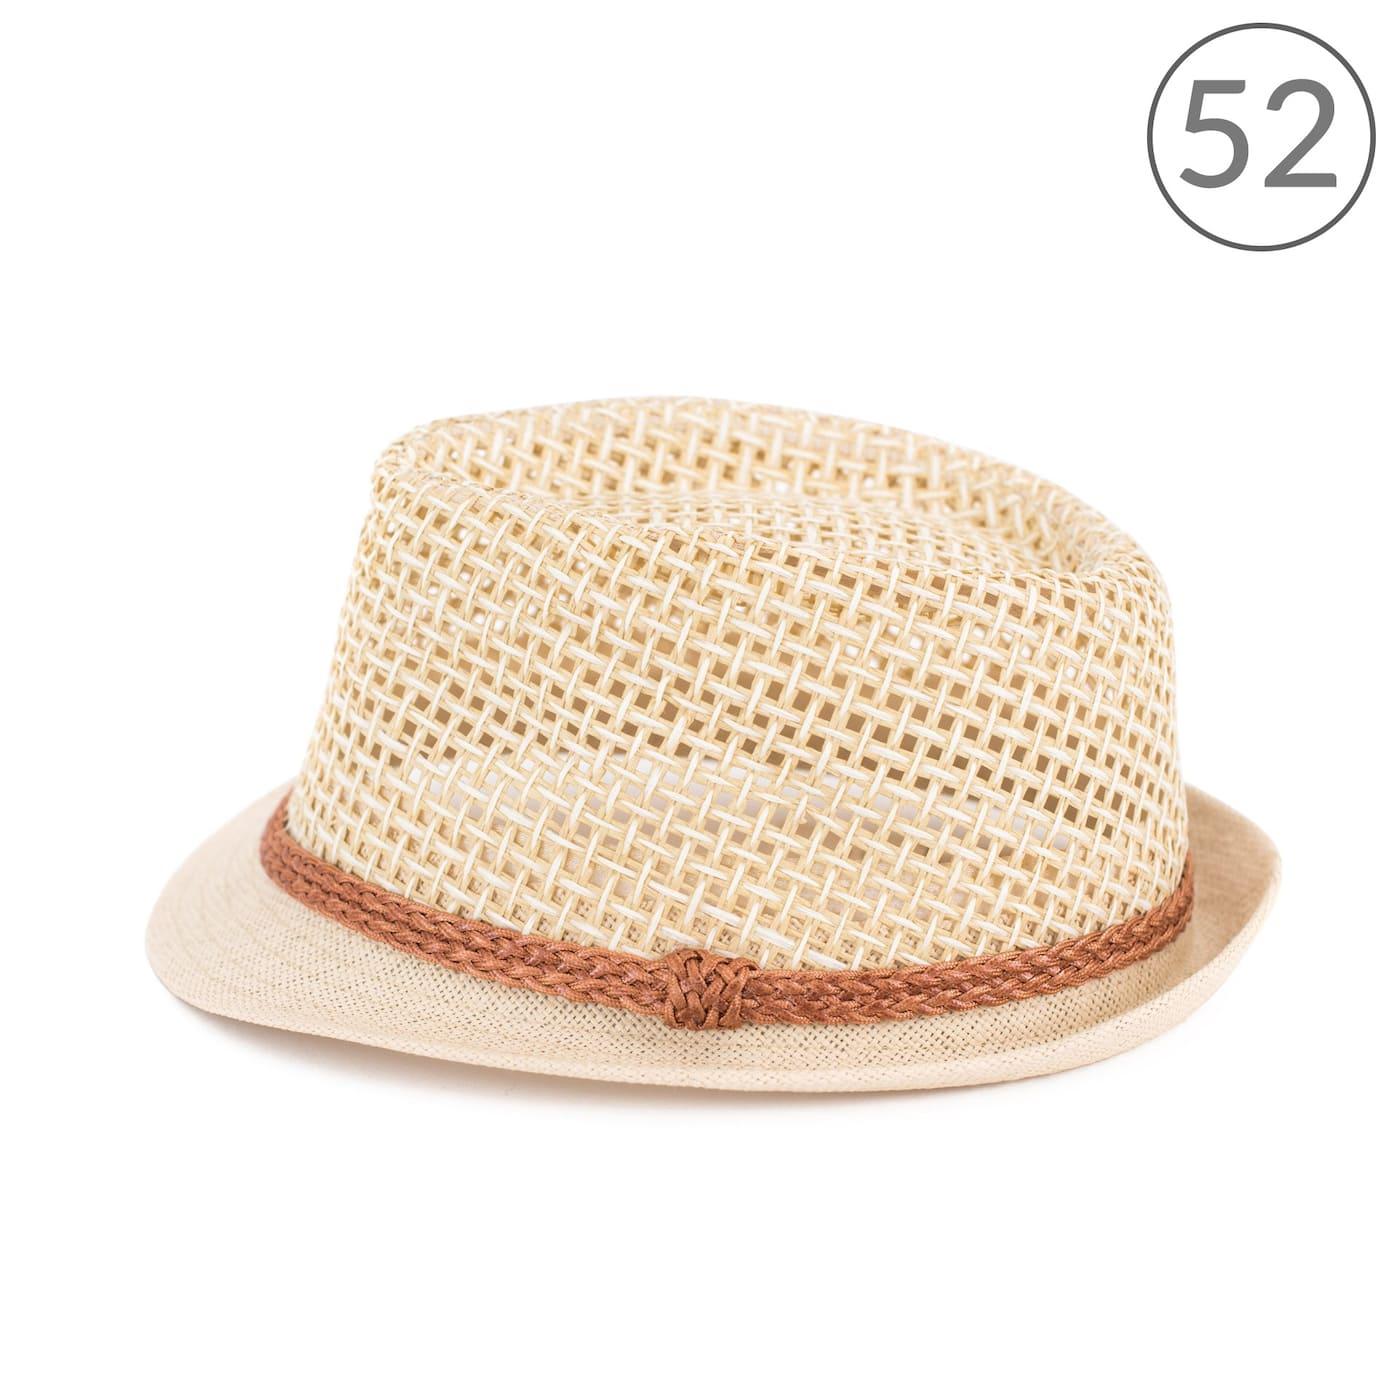 Art Of Polo Unisex's Hat cz19275